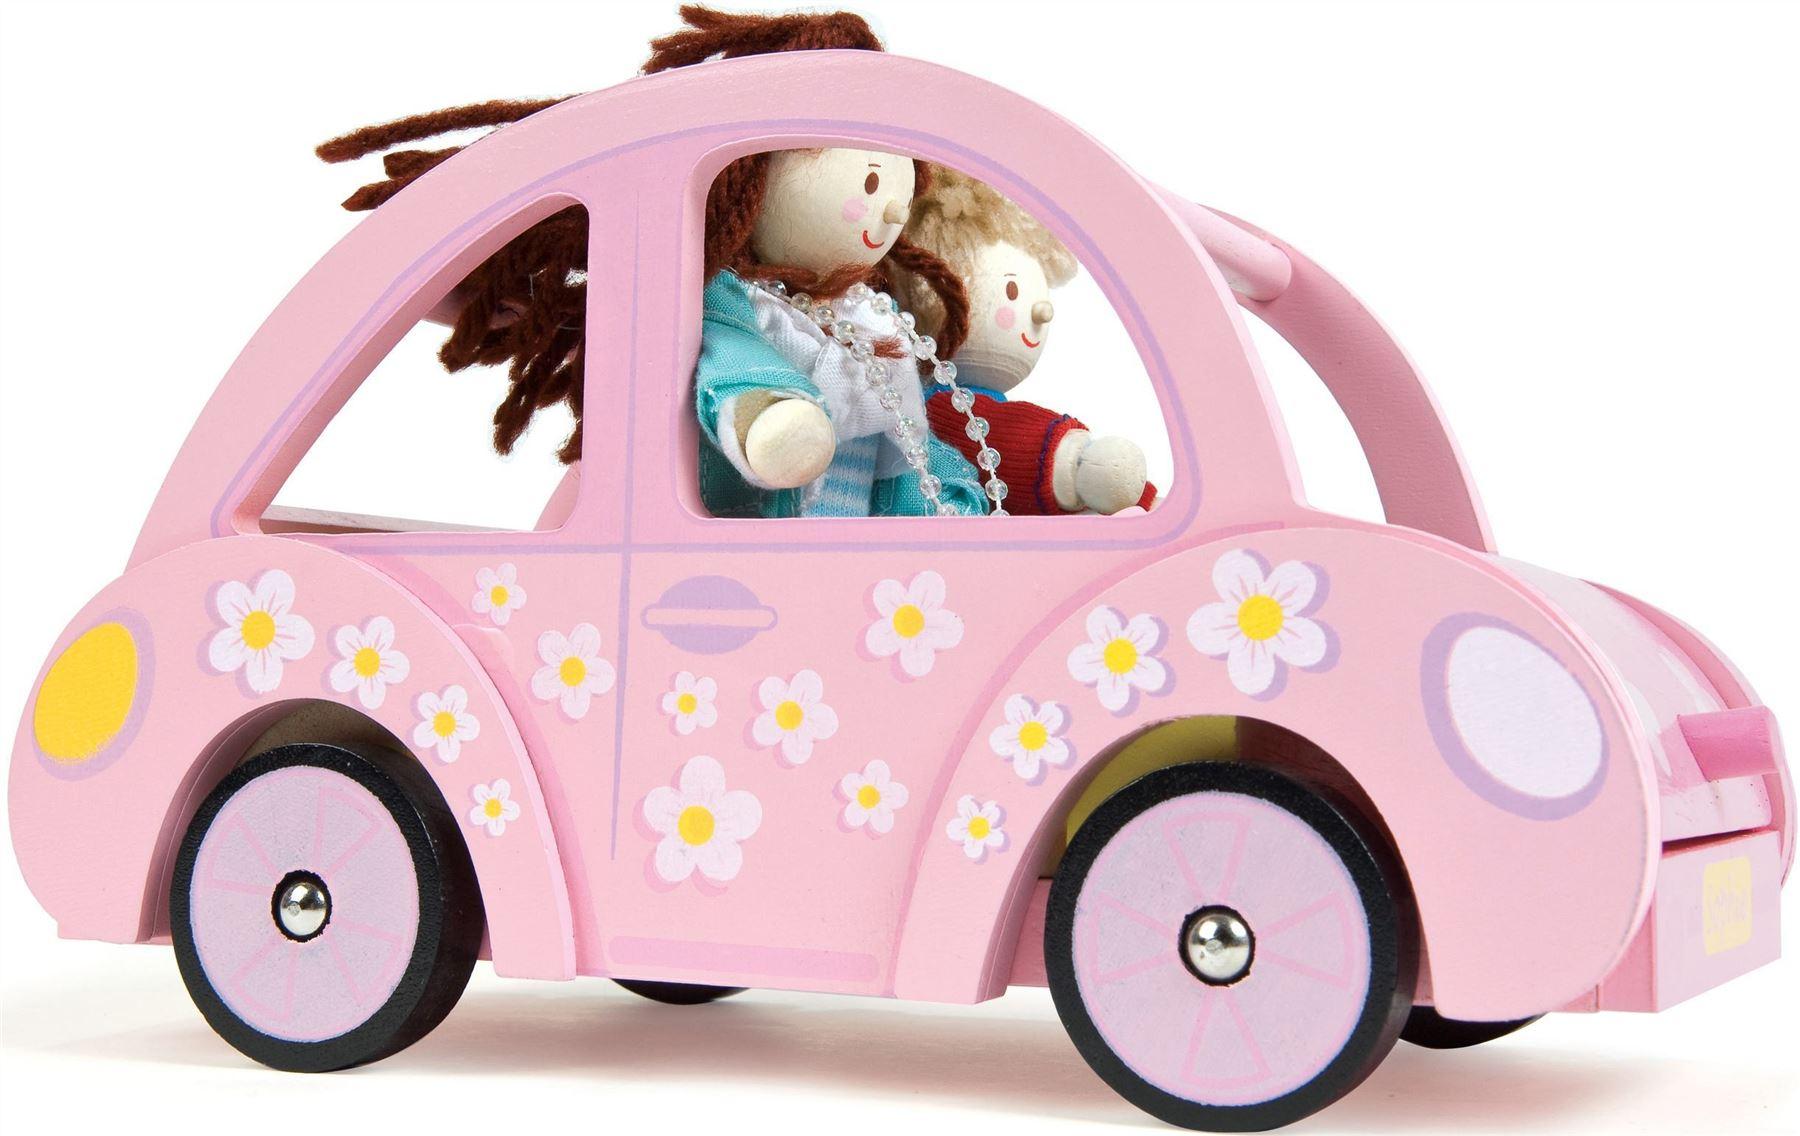 Le Toy Van Sophie's Car Wooden Dolls House Accessory Kids BNIB ...